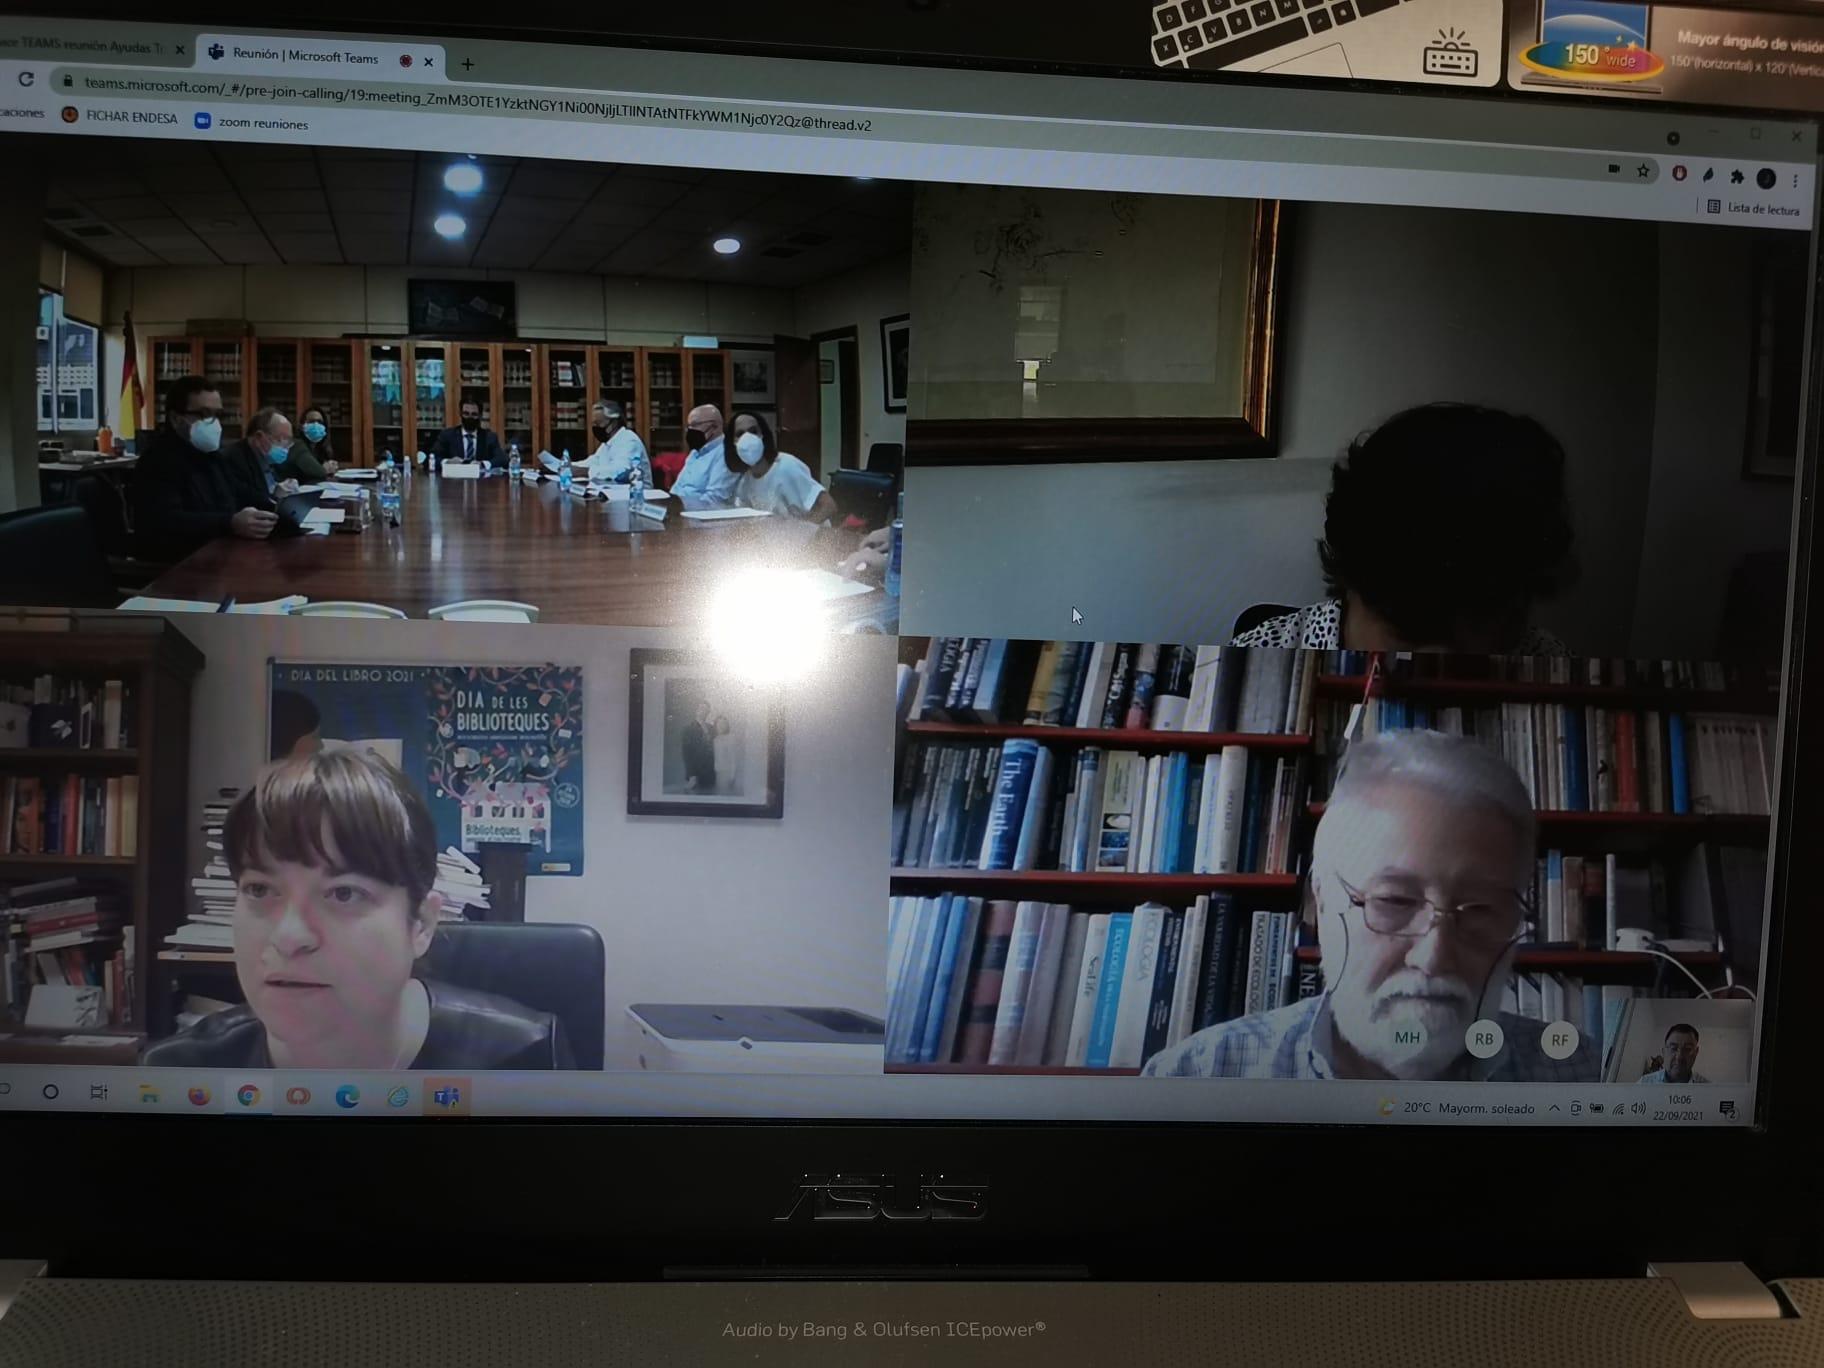 Participacion Dera Acadèmia Ena Comission D'avaloracion D'ajudes Ara Traduccion Entre Lengües Der Estat